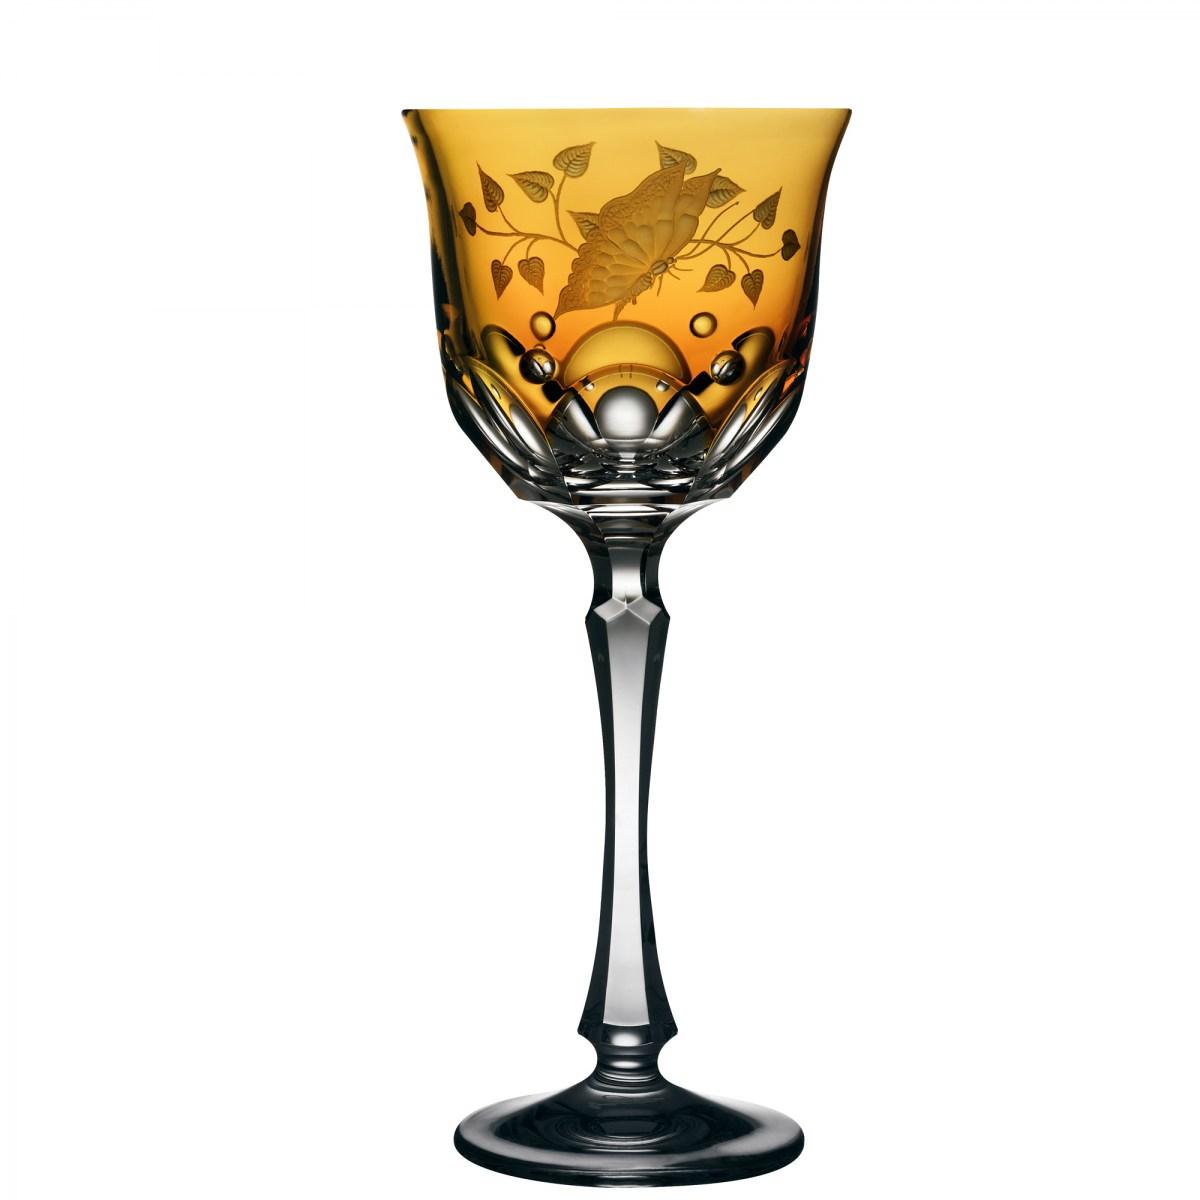 Printemps Amber Water - $ 261 / € 228